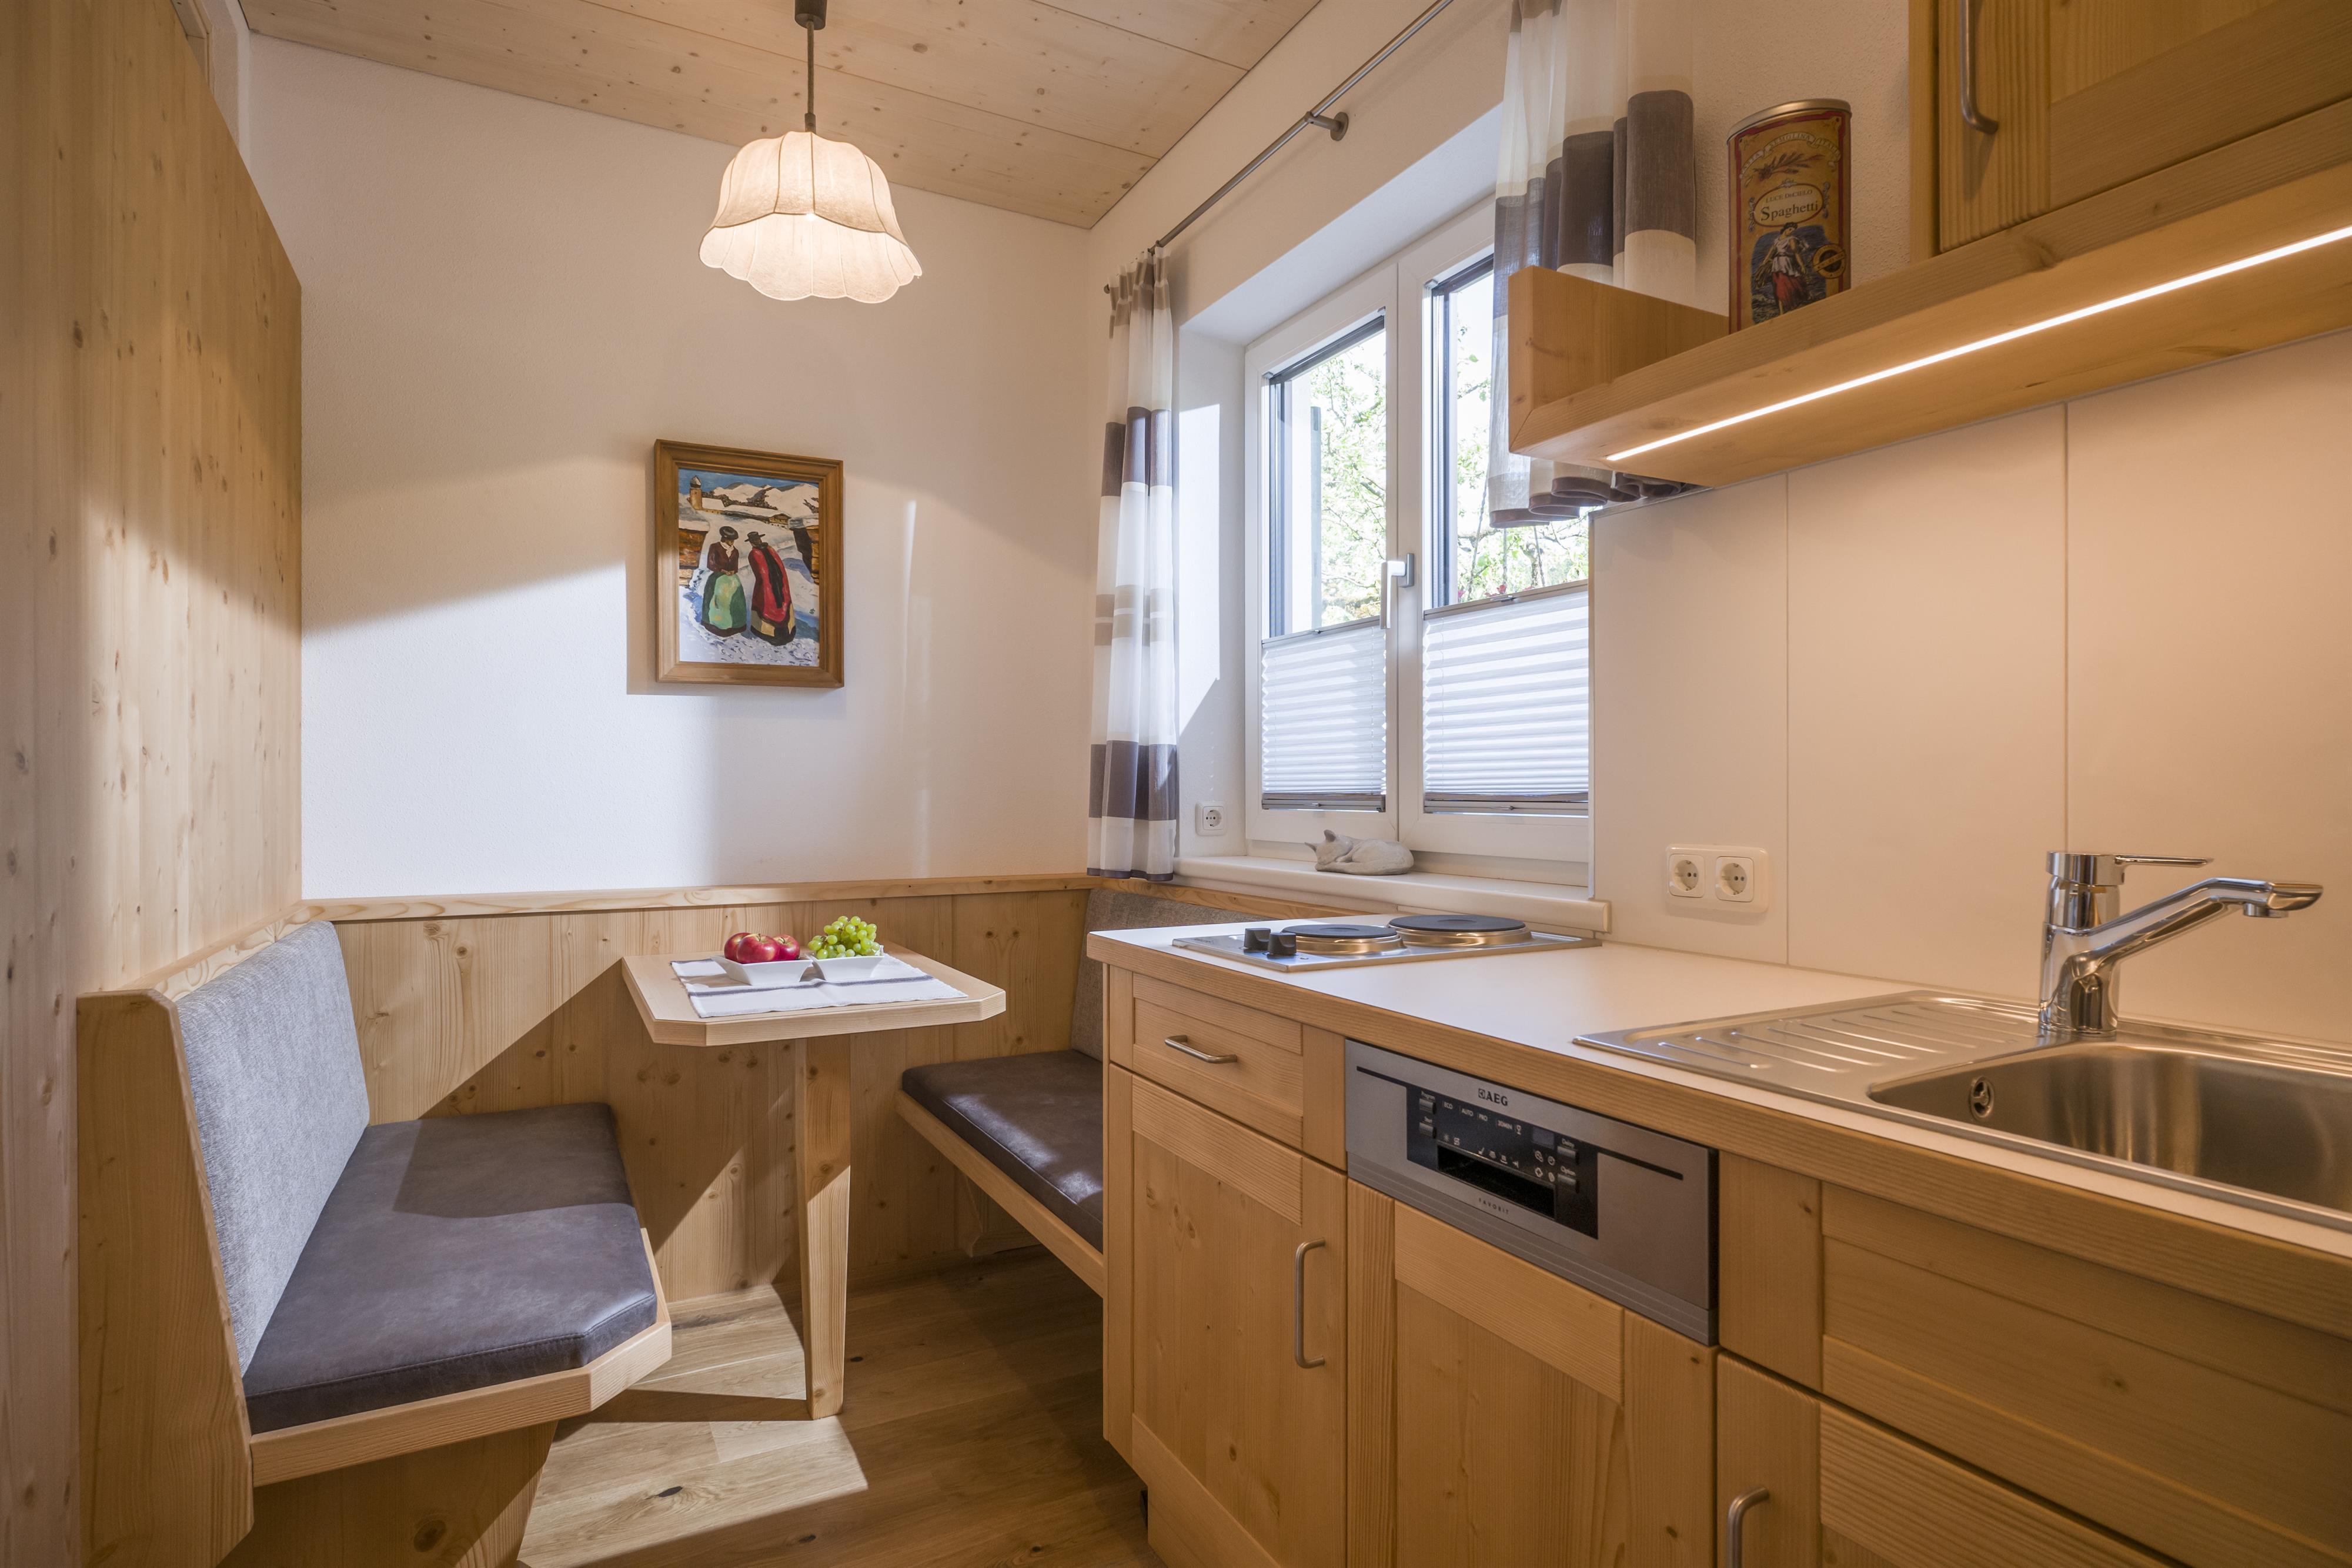 Appartement de vacances Haus Horngacher Appartement Naturgenuss (2224360), Scheffau am Wilden Kaiser, Wilder Kaiser, Tyrol, Autriche, image 16